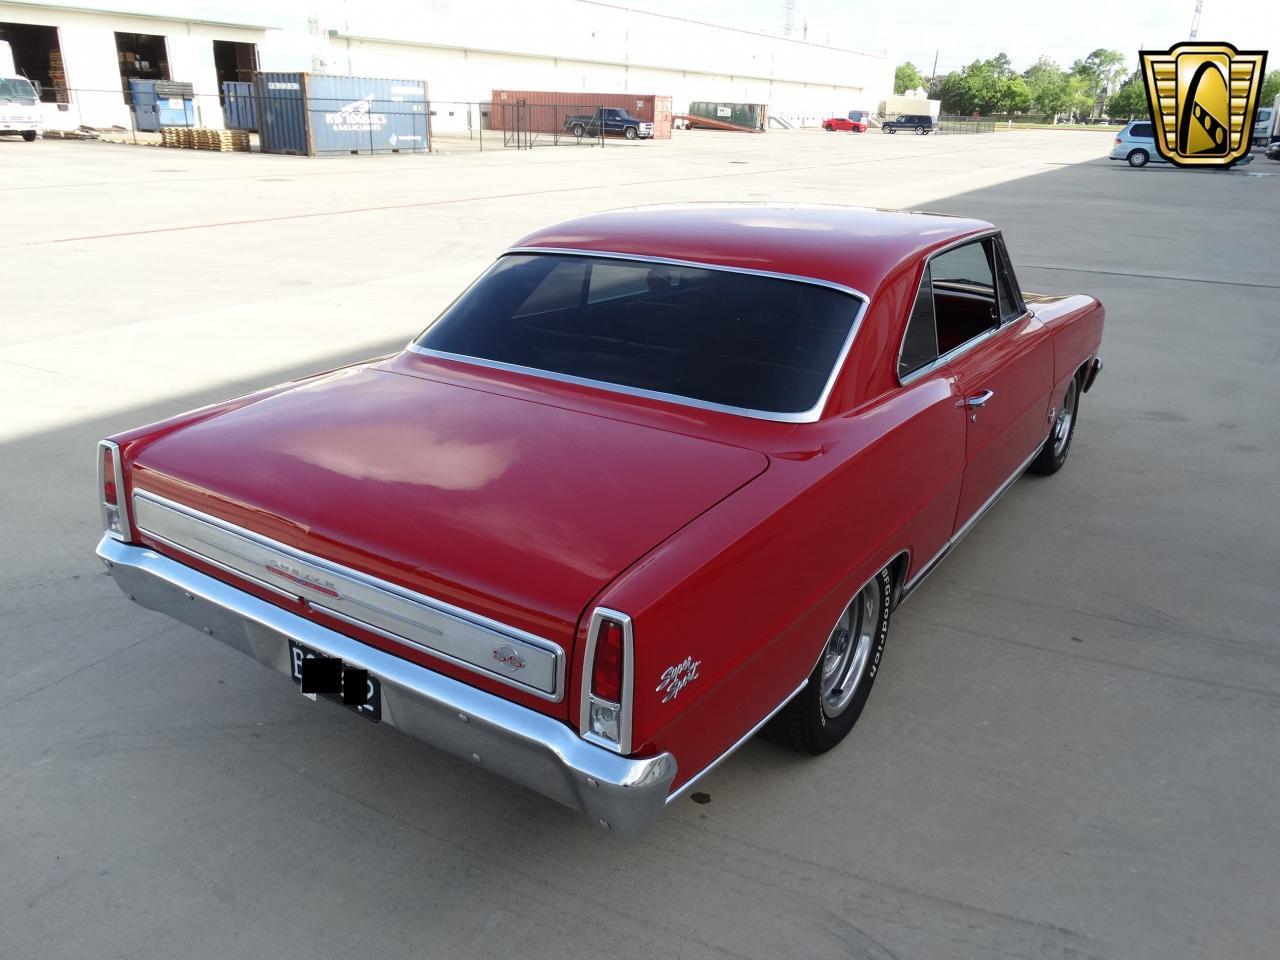 Large Picture of Classic 1966 Chevrolet Nova - $50,000.00 - KEGQ